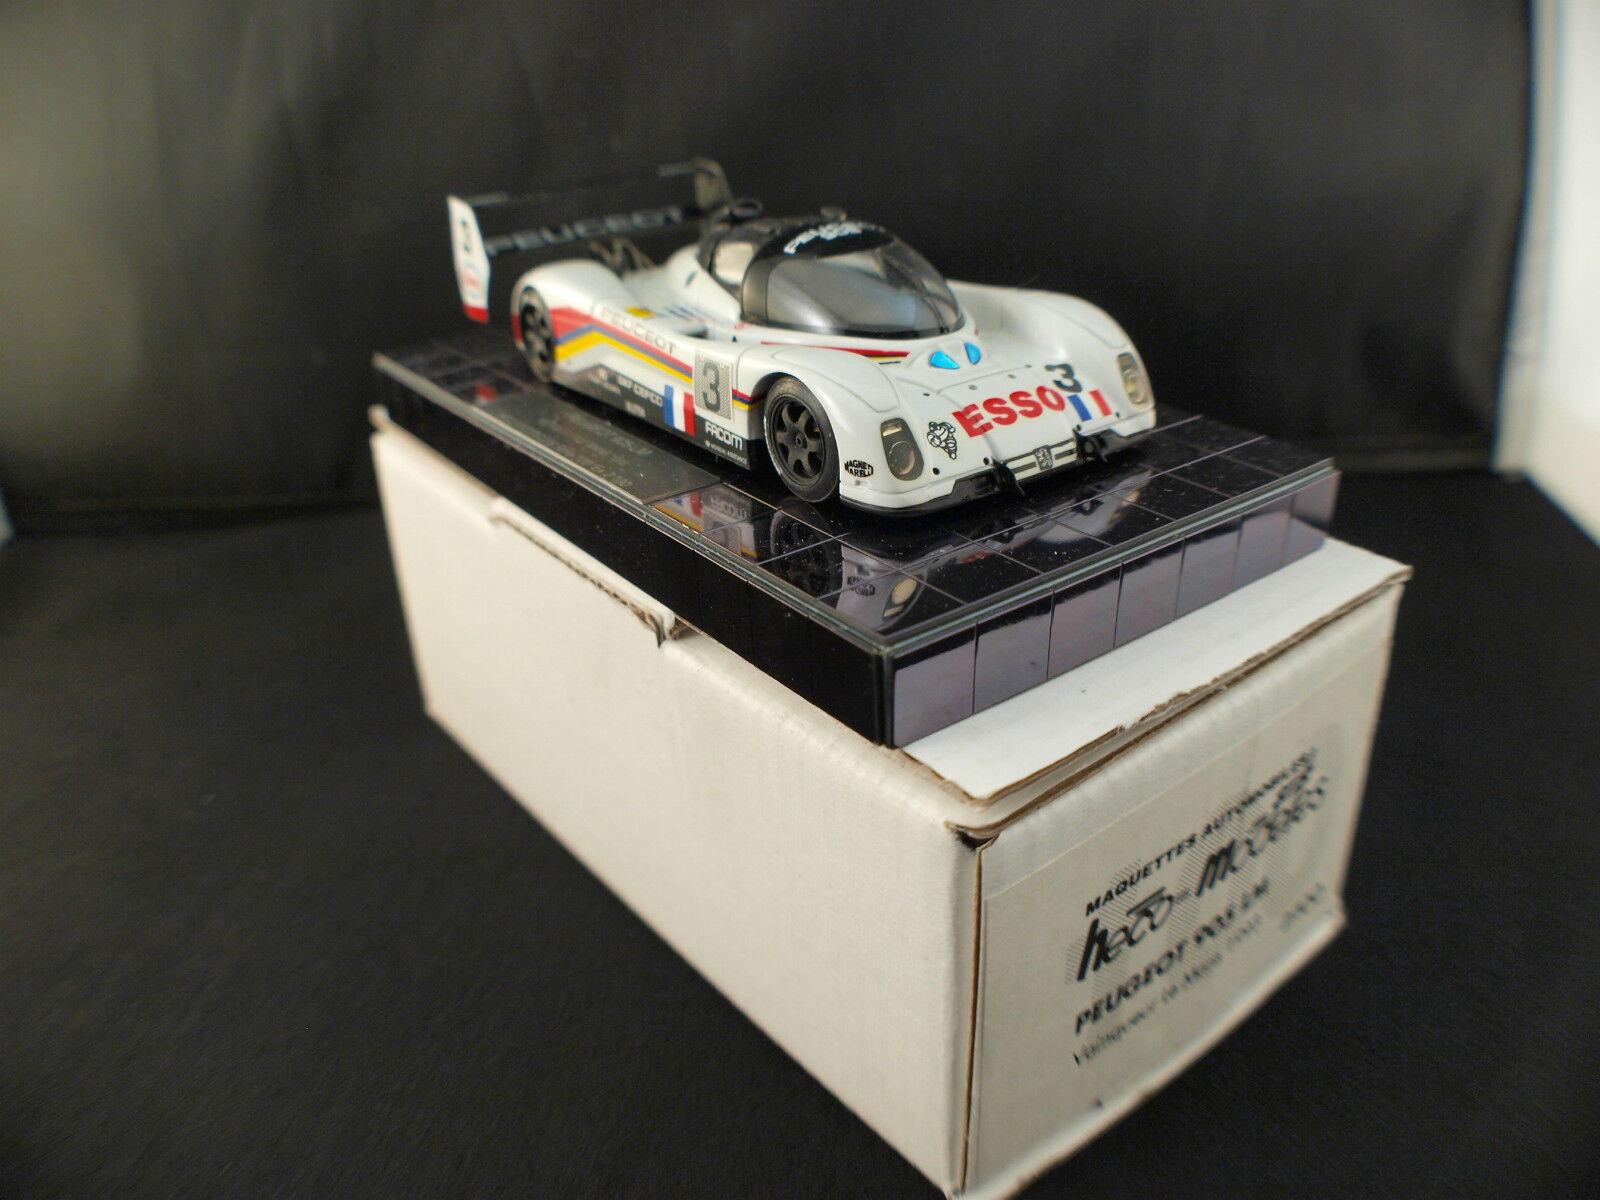 Heco Miniatures Peugeot 905 LM #3 1993 Brabham Brabham Brabham 1/43 neuf inbox/boîte MIB RARE c99741